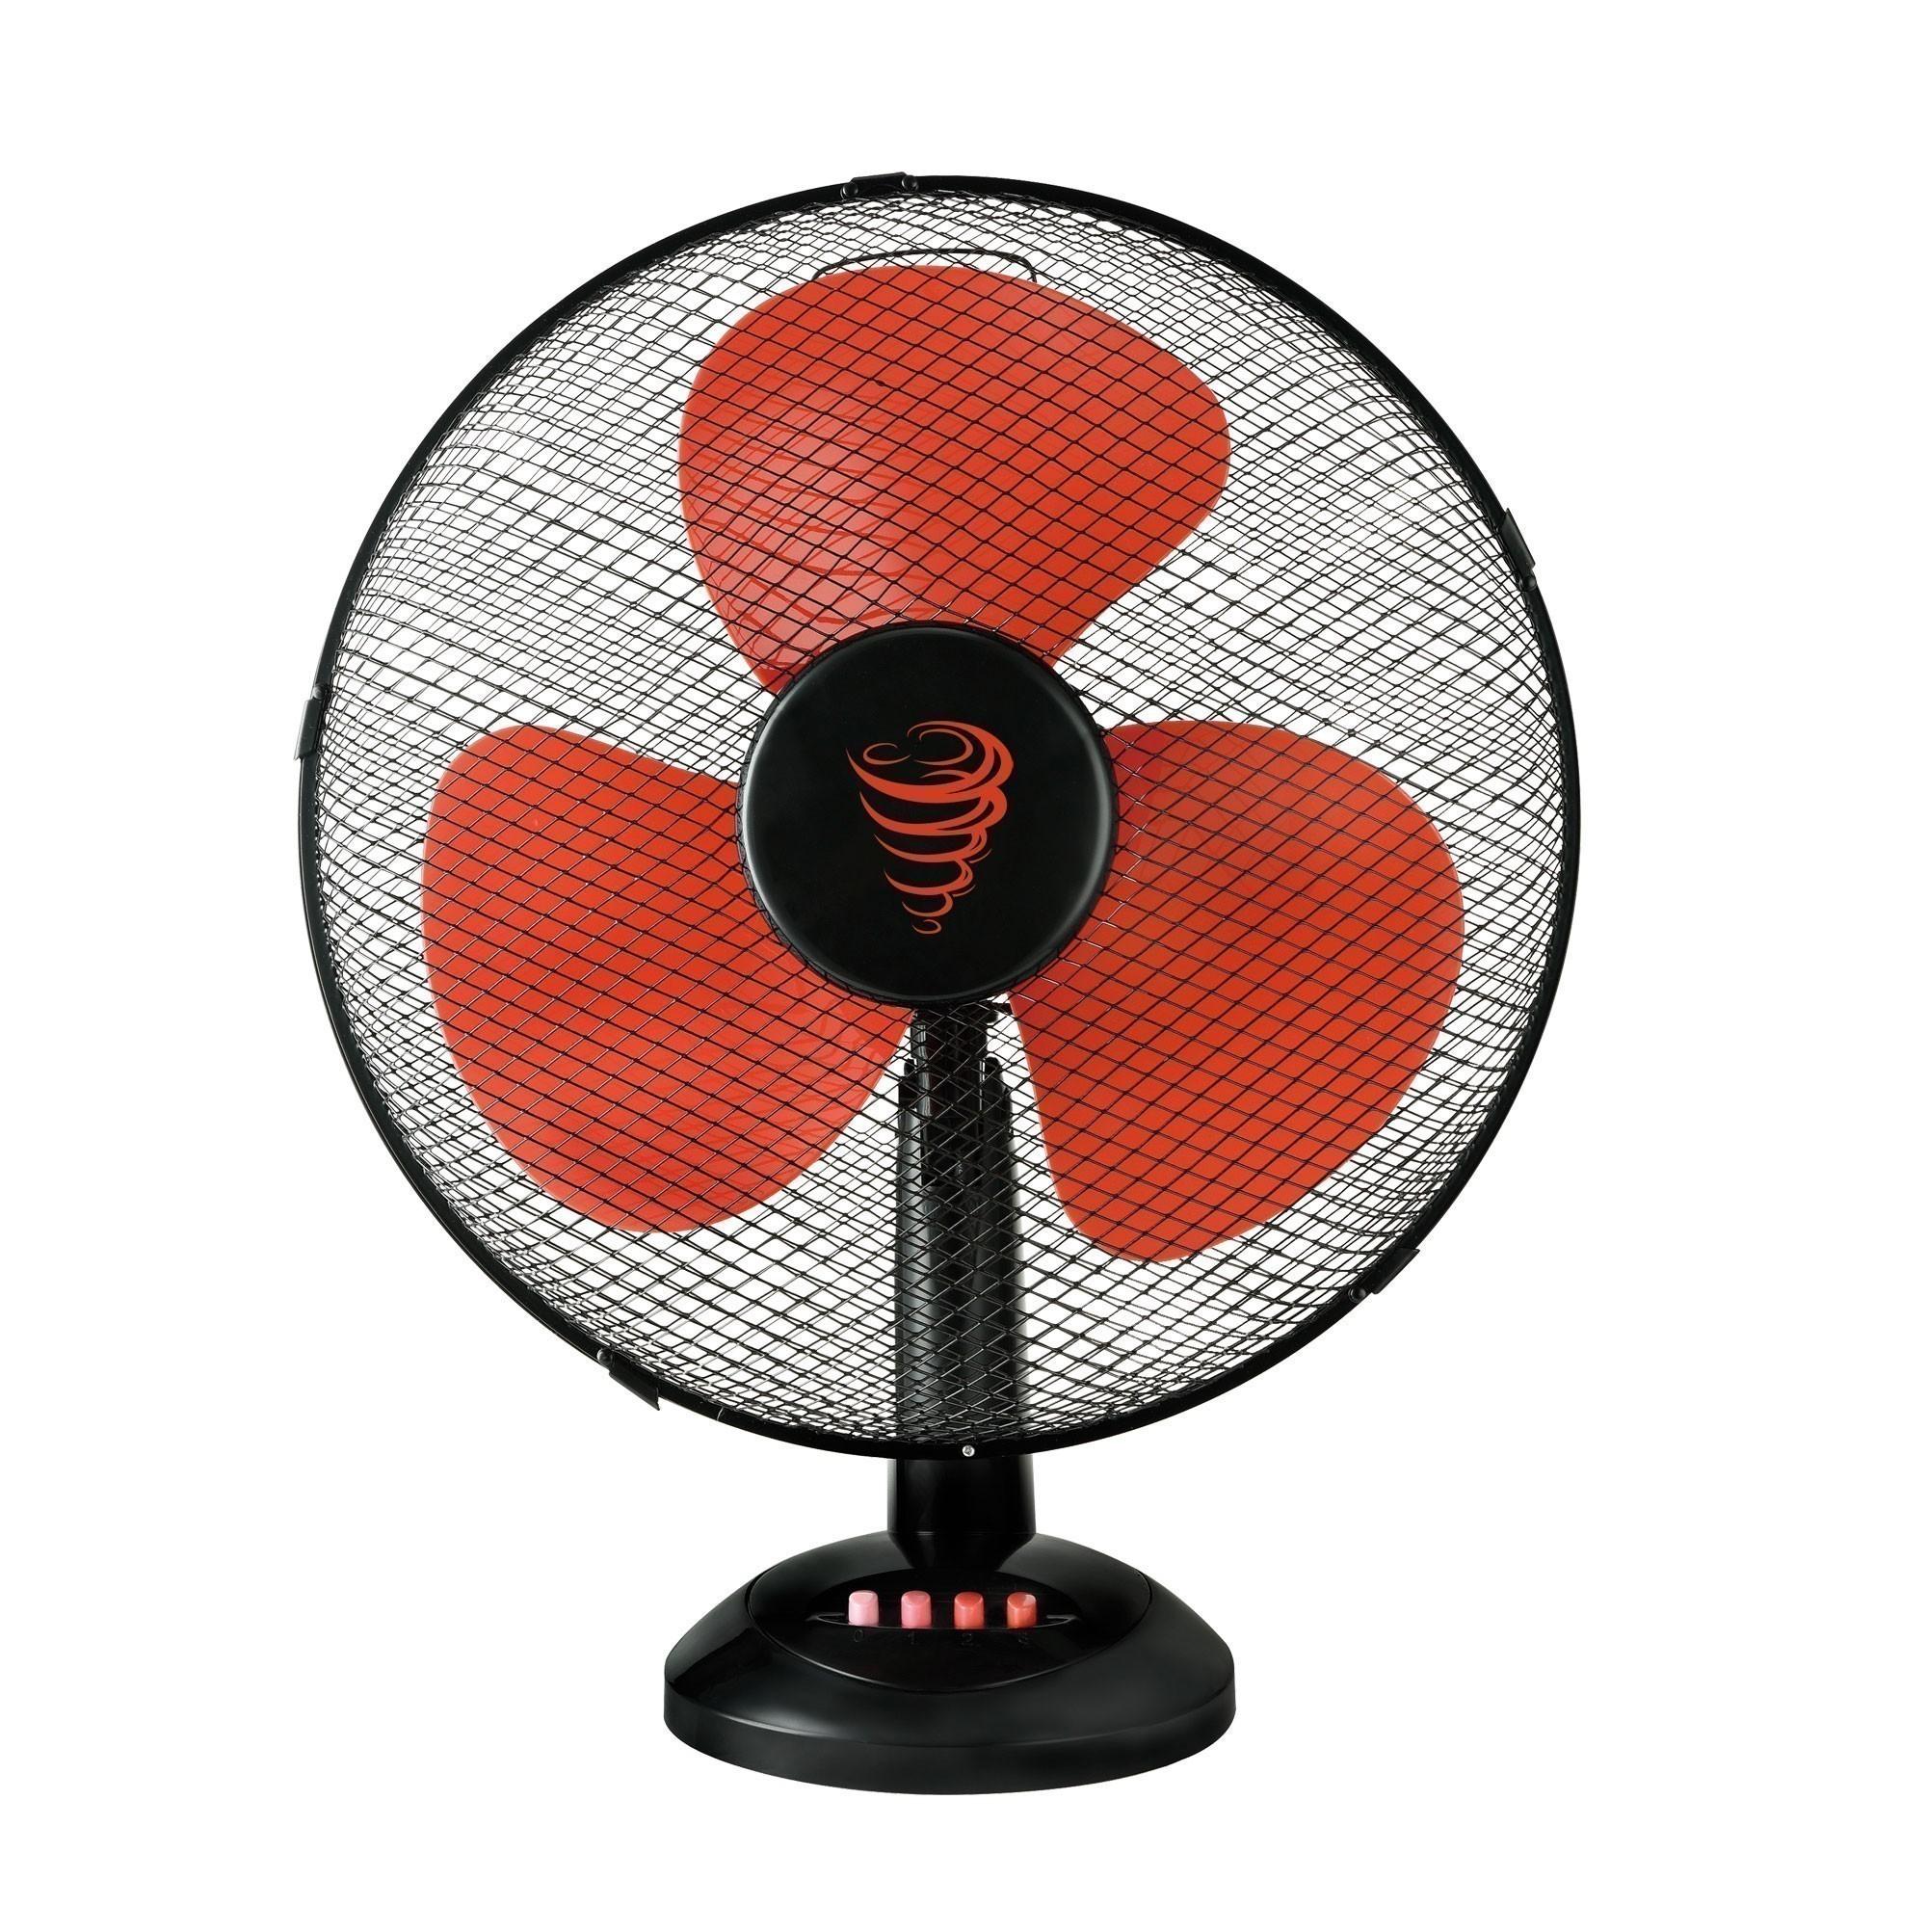 ventilator tischventilator kalorik tkg vt 1016 r bei. Black Bedroom Furniture Sets. Home Design Ideas